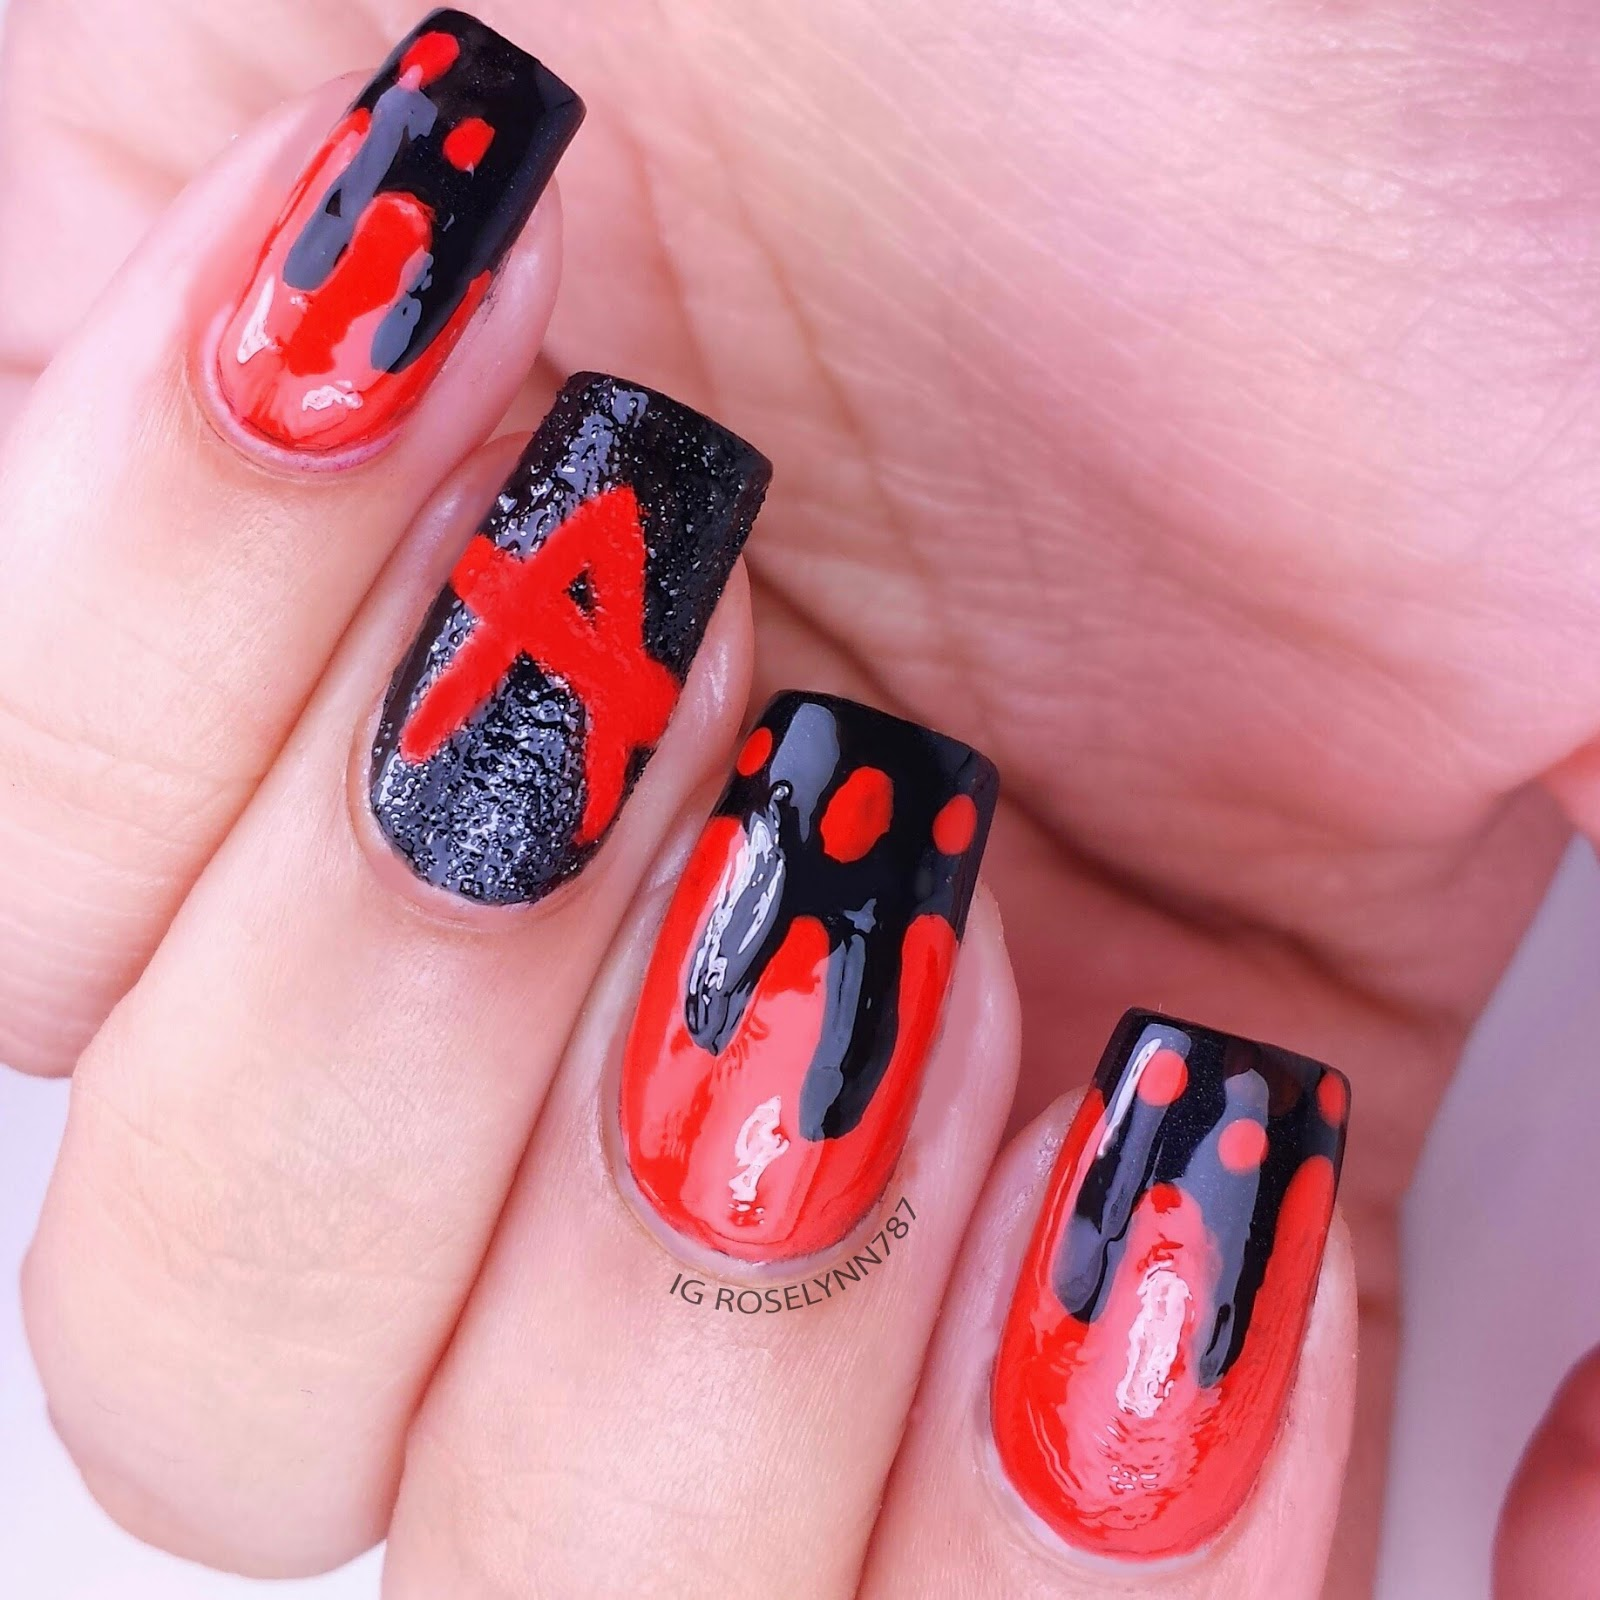 acrylic nails pretty little liars photo - 1